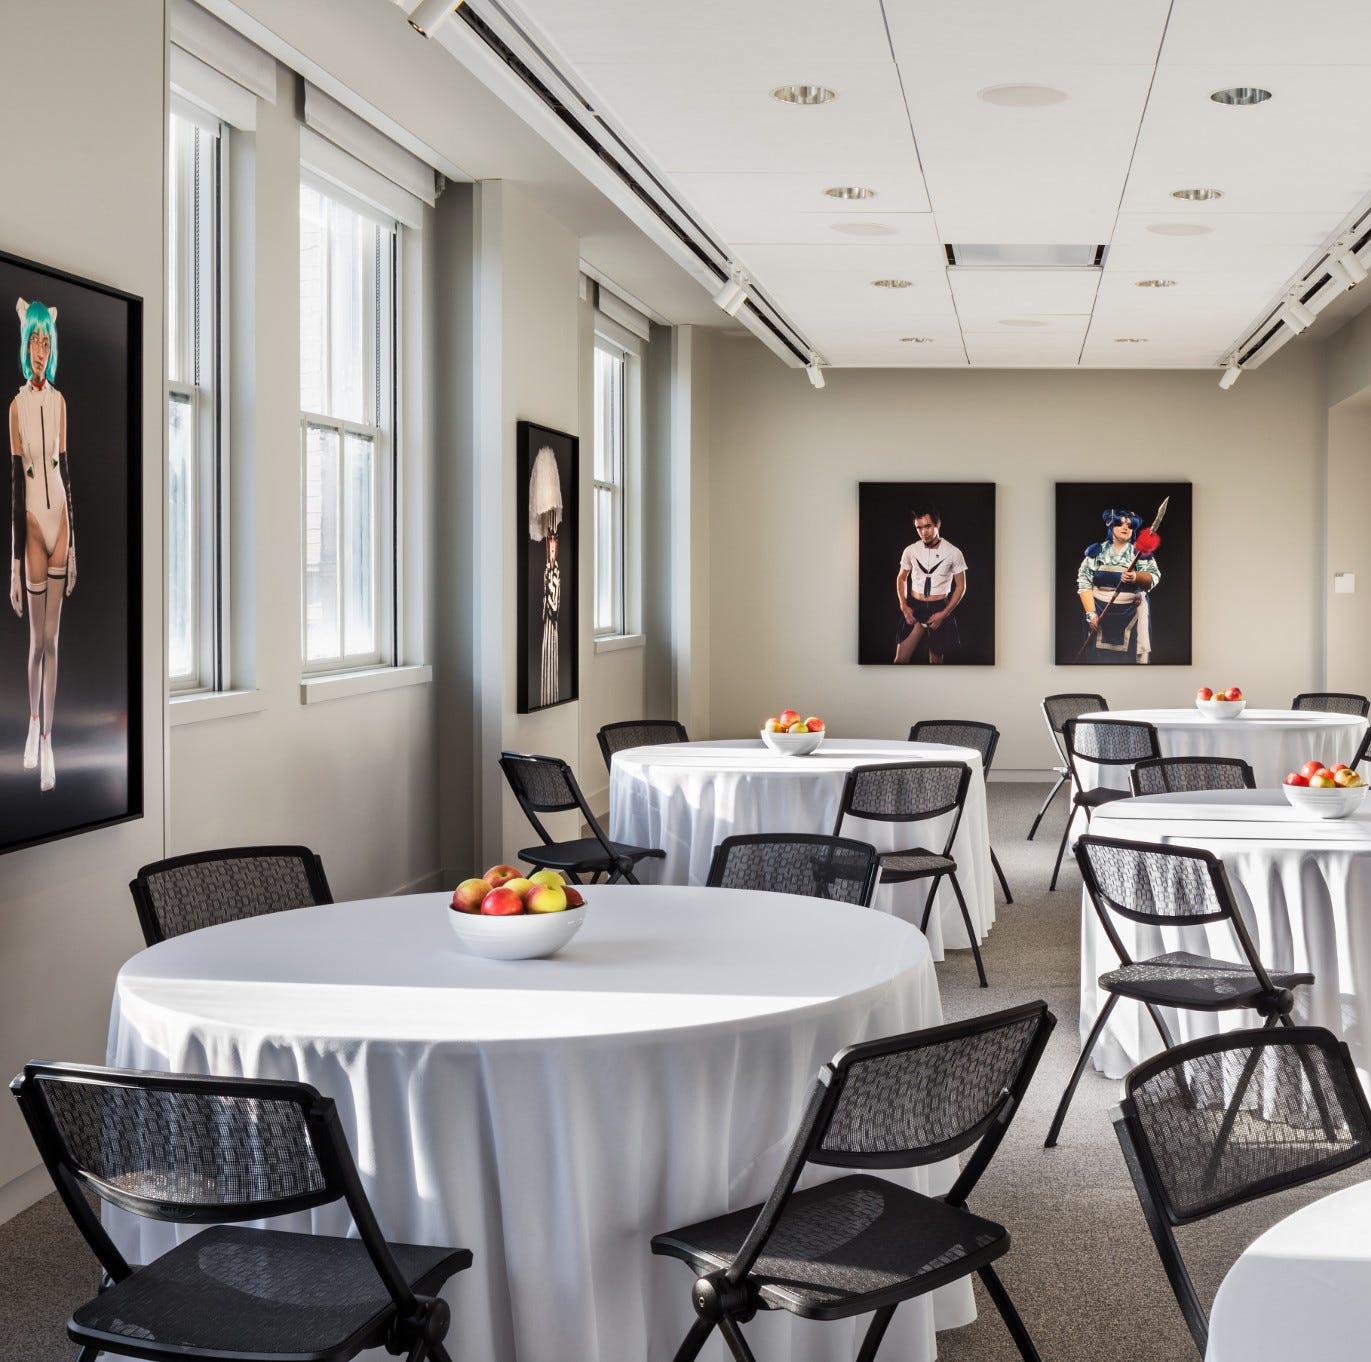 21c HOTEL: ART MUSEUM MEETS BOUTIQUE HOTEL